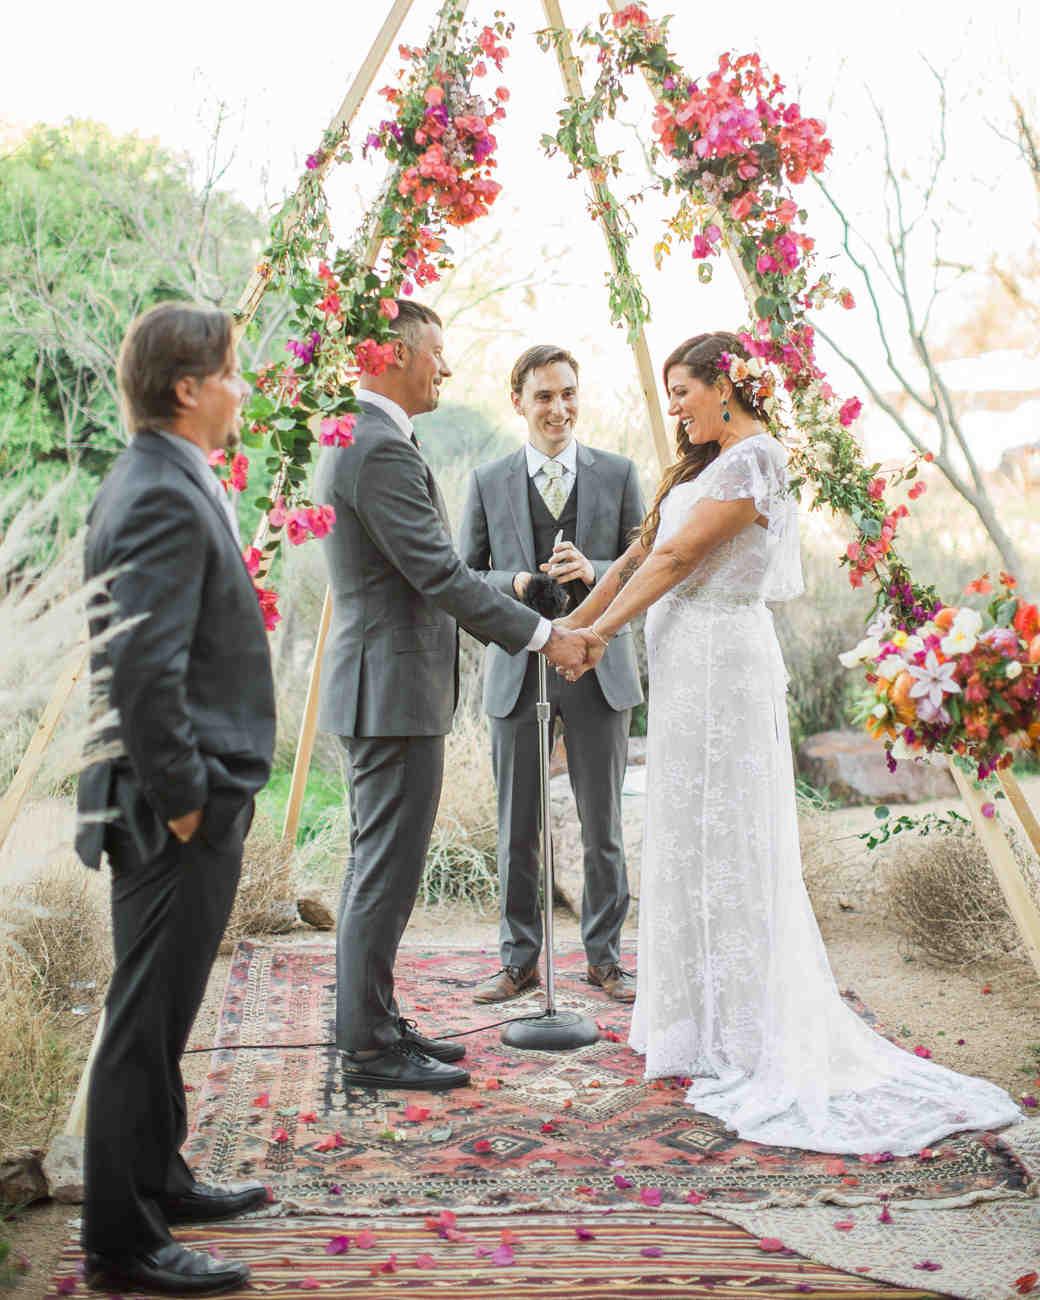 lara-chad-wedding-ceremony-430-s112306-1115.jpg